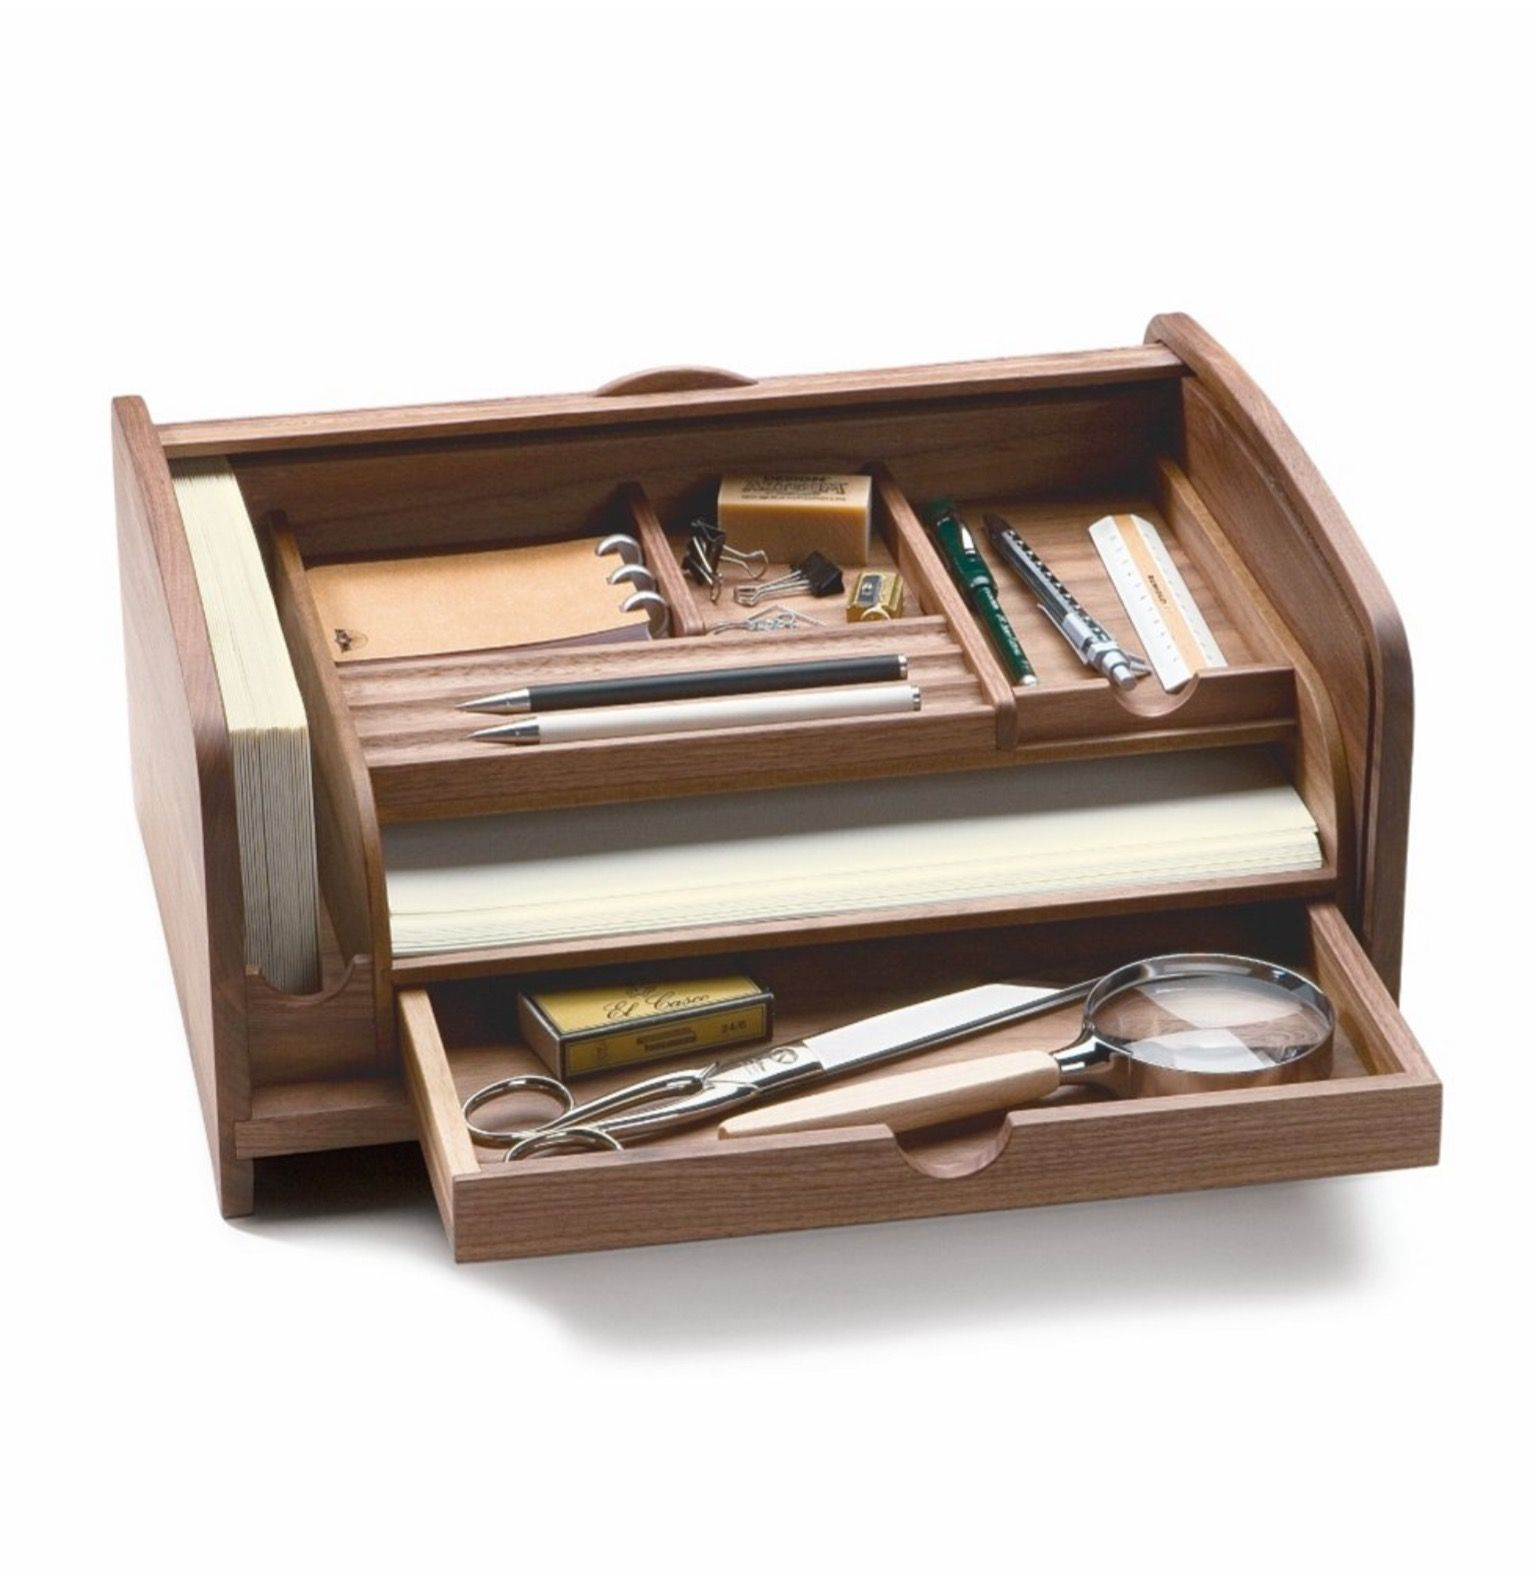 Pin By Servais On Desk Bureau Accessories Walnut Desks Desk Organization Woodworking